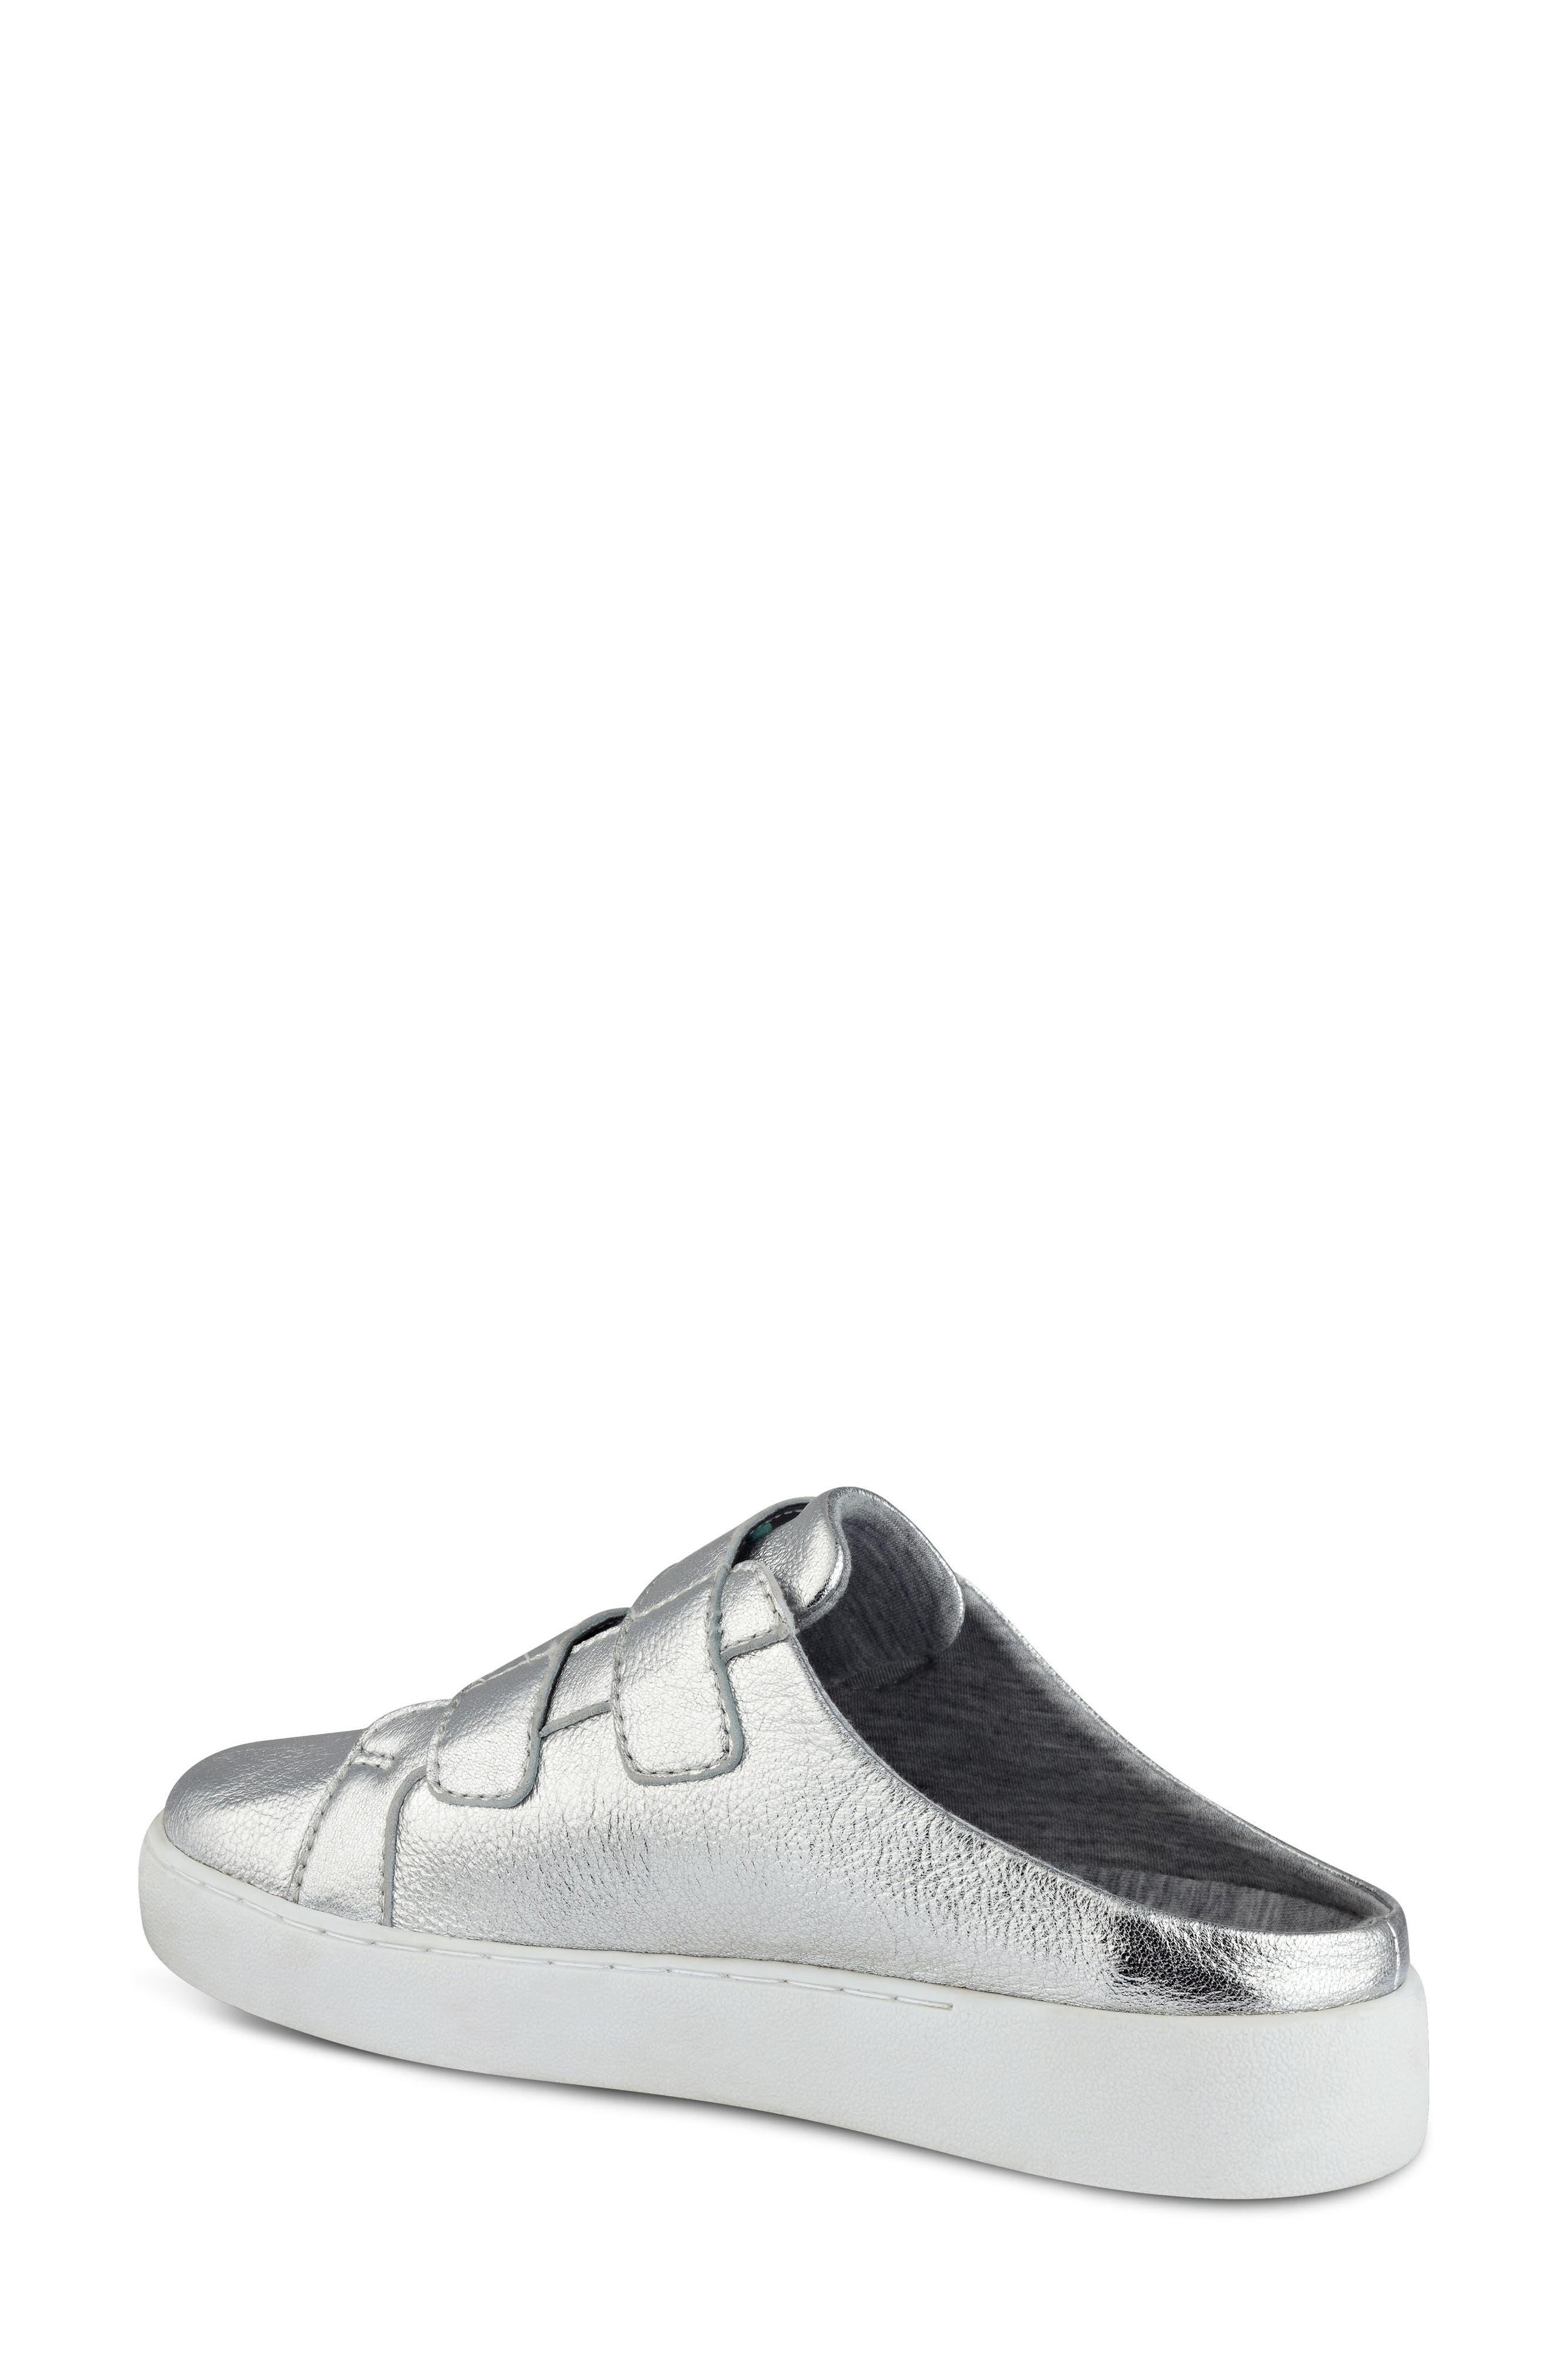 Alternate Image 2  - Nine West Poeton Sneaker Mule (Women)